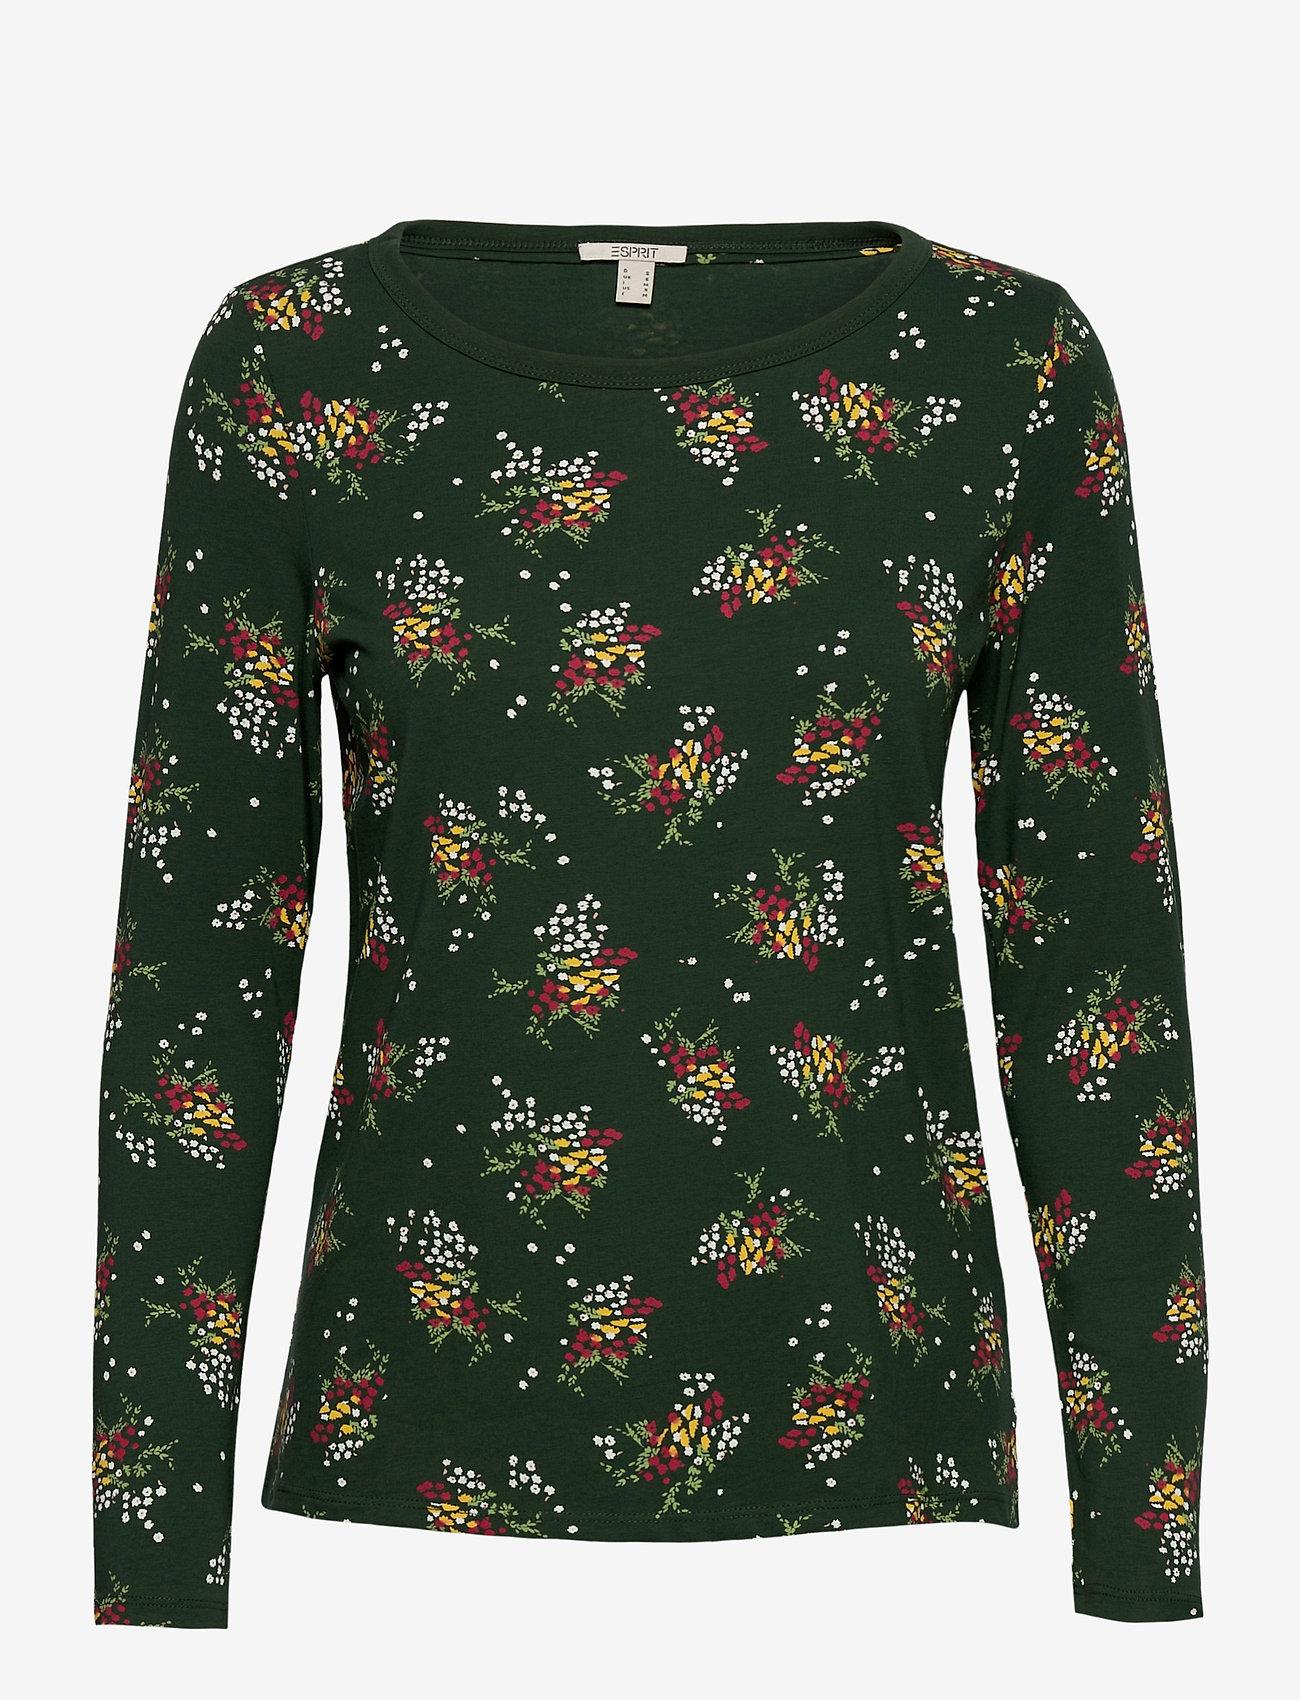 Esprit Casual - T-Shirts - long-sleeved tops - dark green - 0